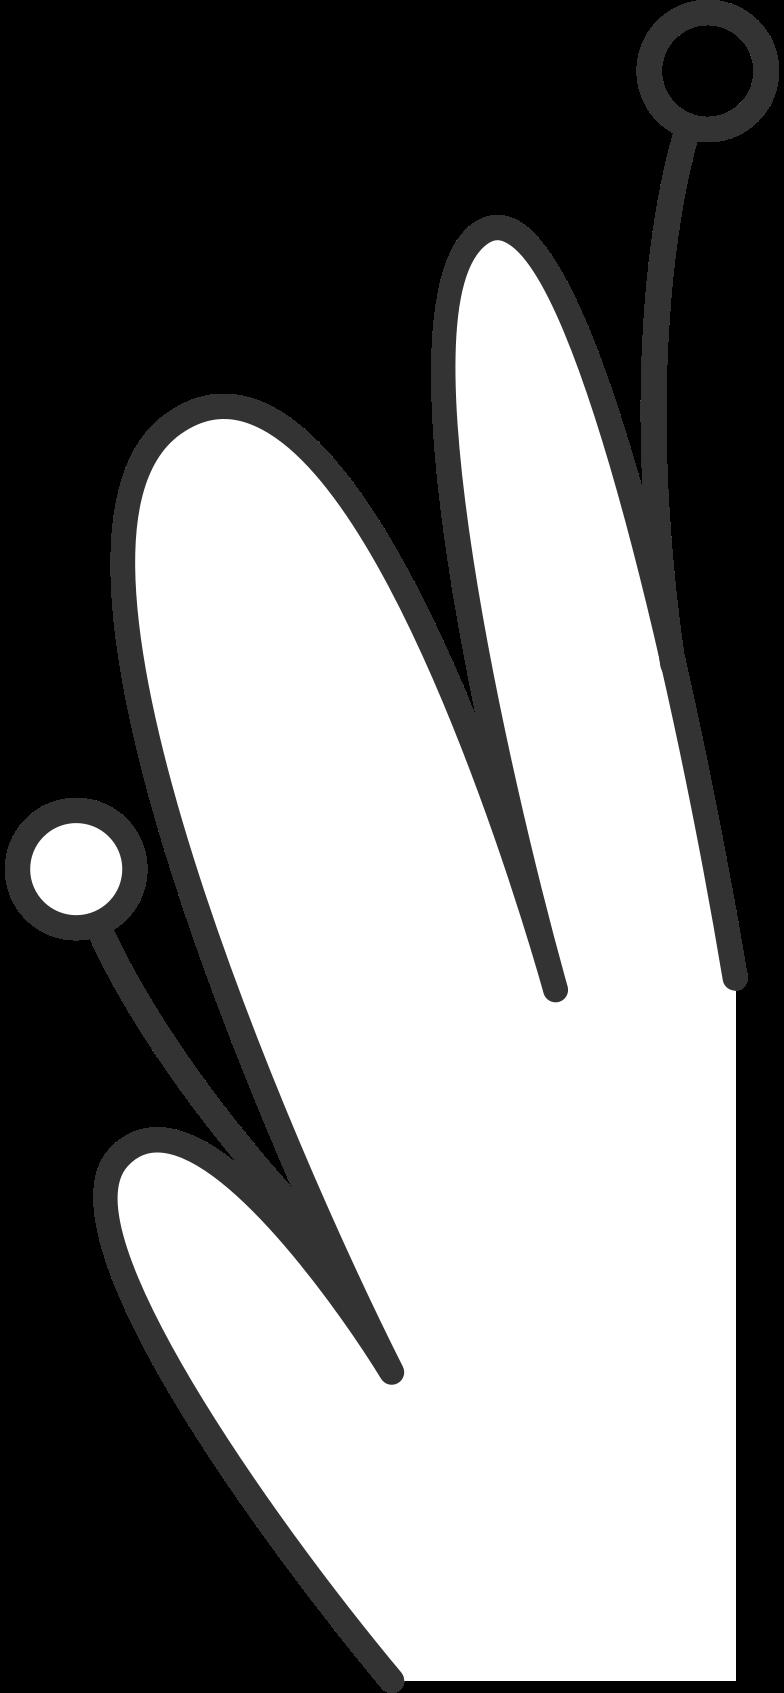 no comments  bush Clipart illustration in PNG, SVG